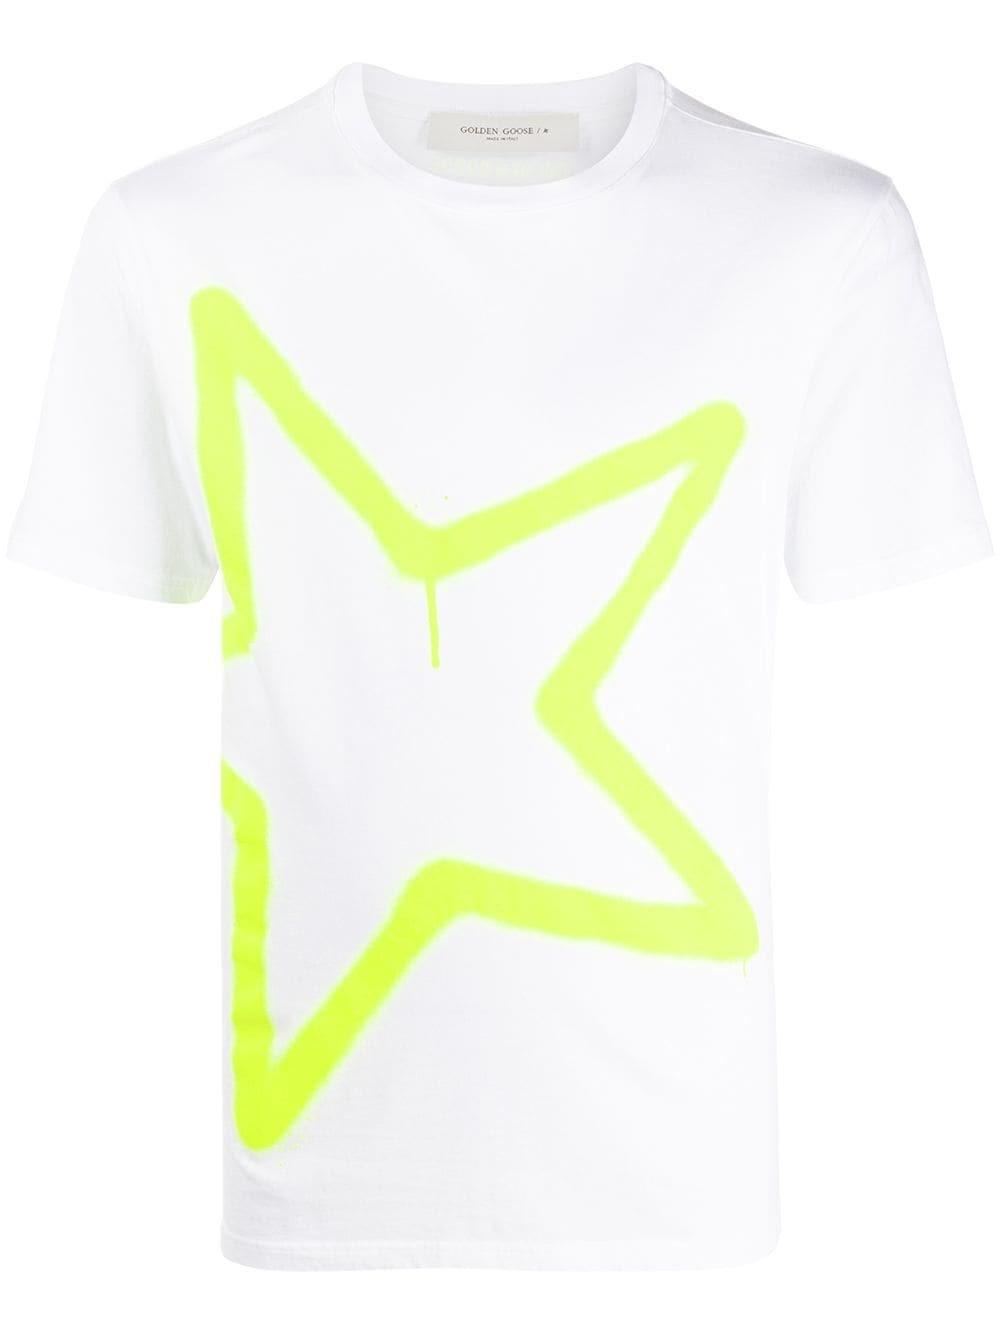 GOLDEN GOOSE DELUXE BRAND Fluo Star T-Shirt